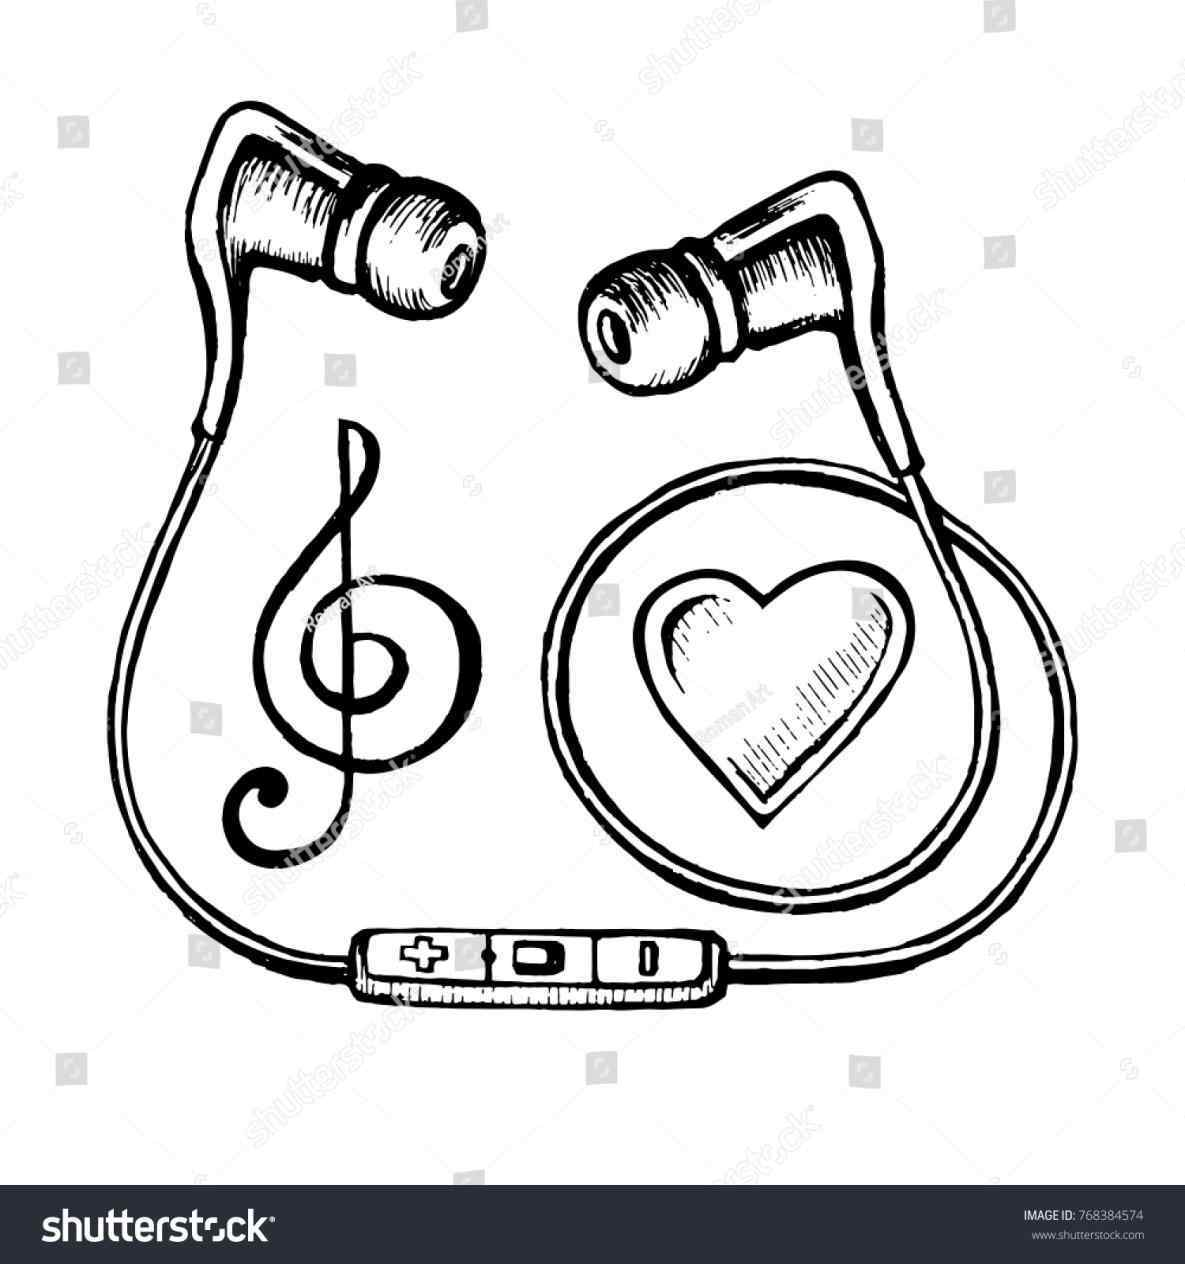 1185x1264 Microphone And Music Notes Drawing Mayamokacomm